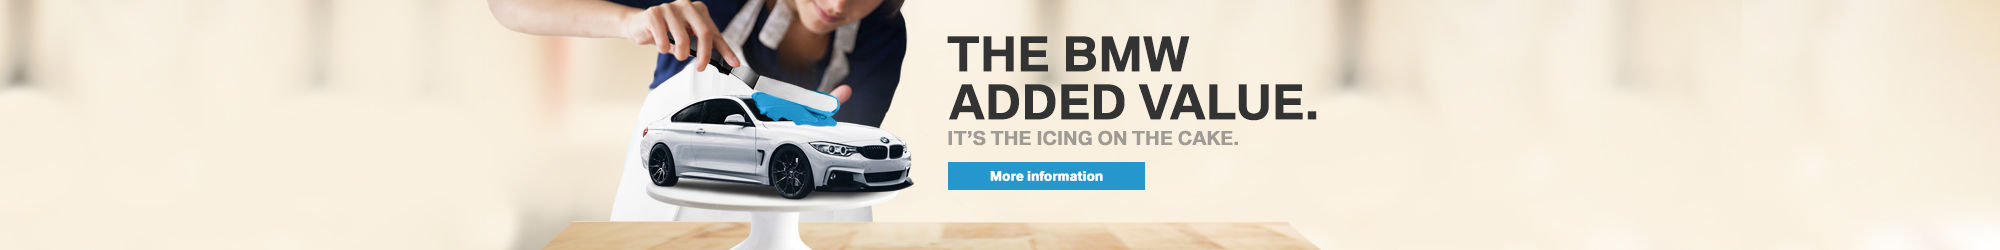 Grenier BMW added value